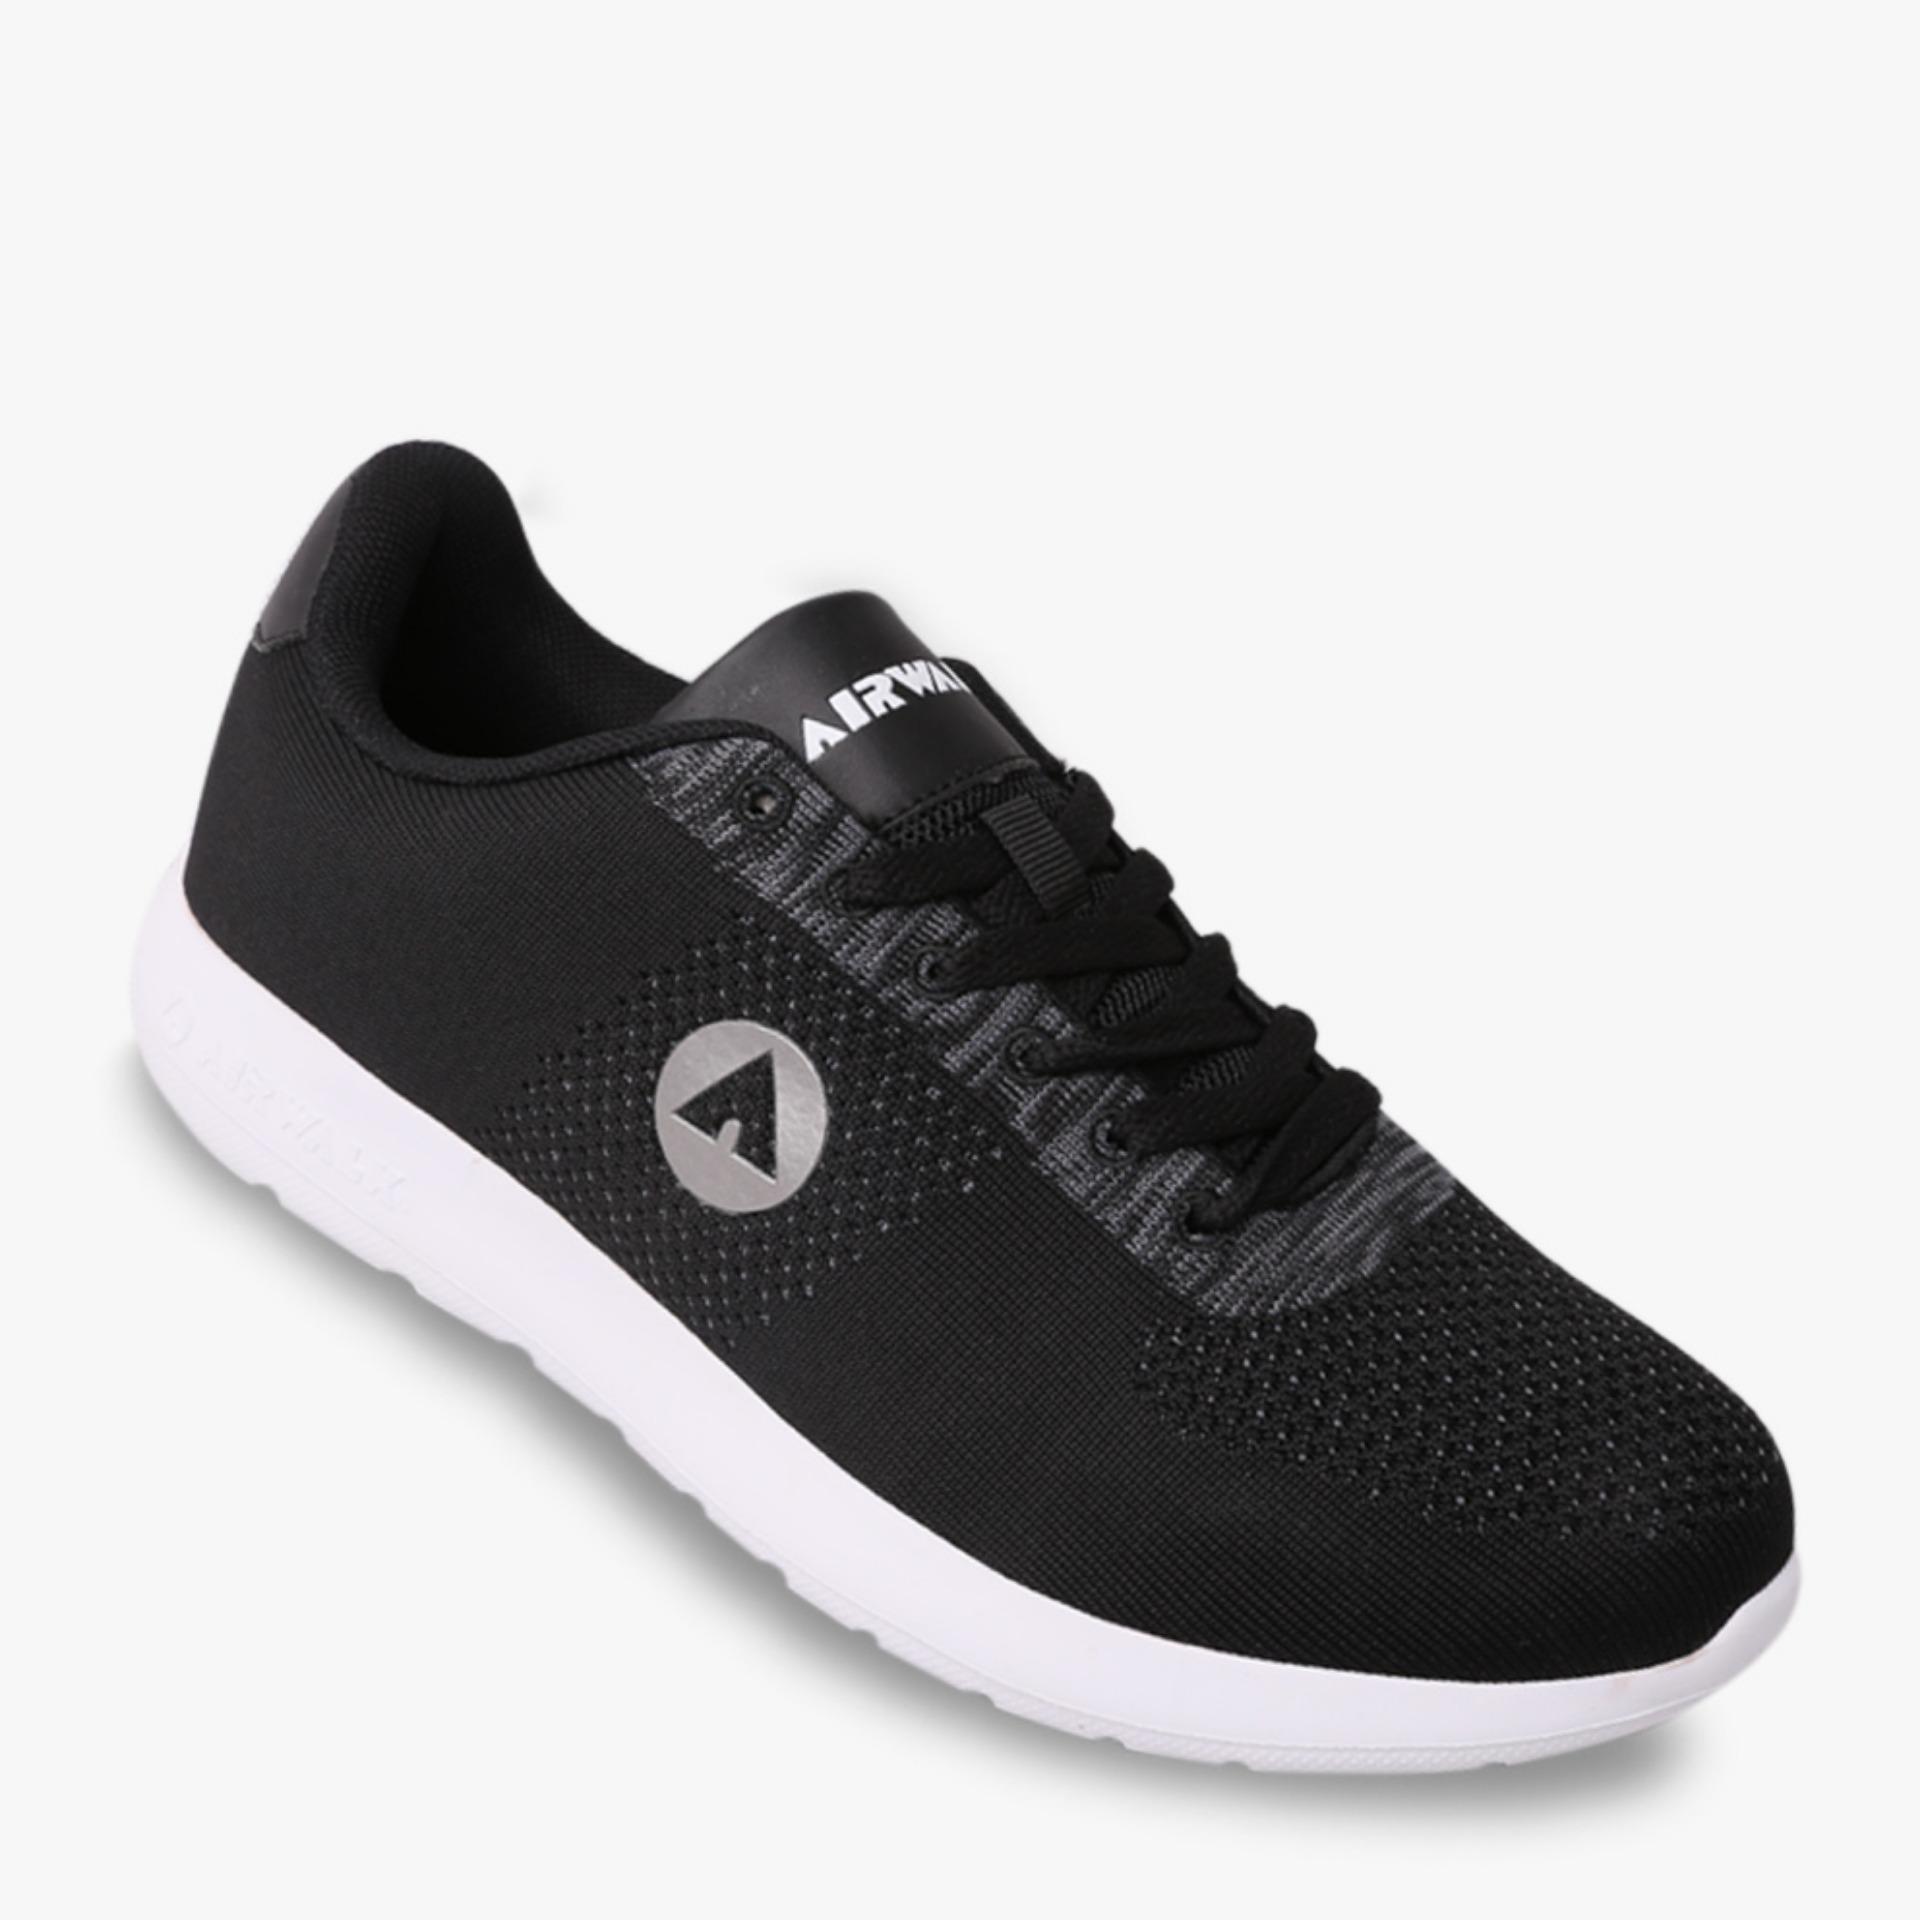 Harga Airwalk Hofman Men S Sneakers Shoes Hitam New